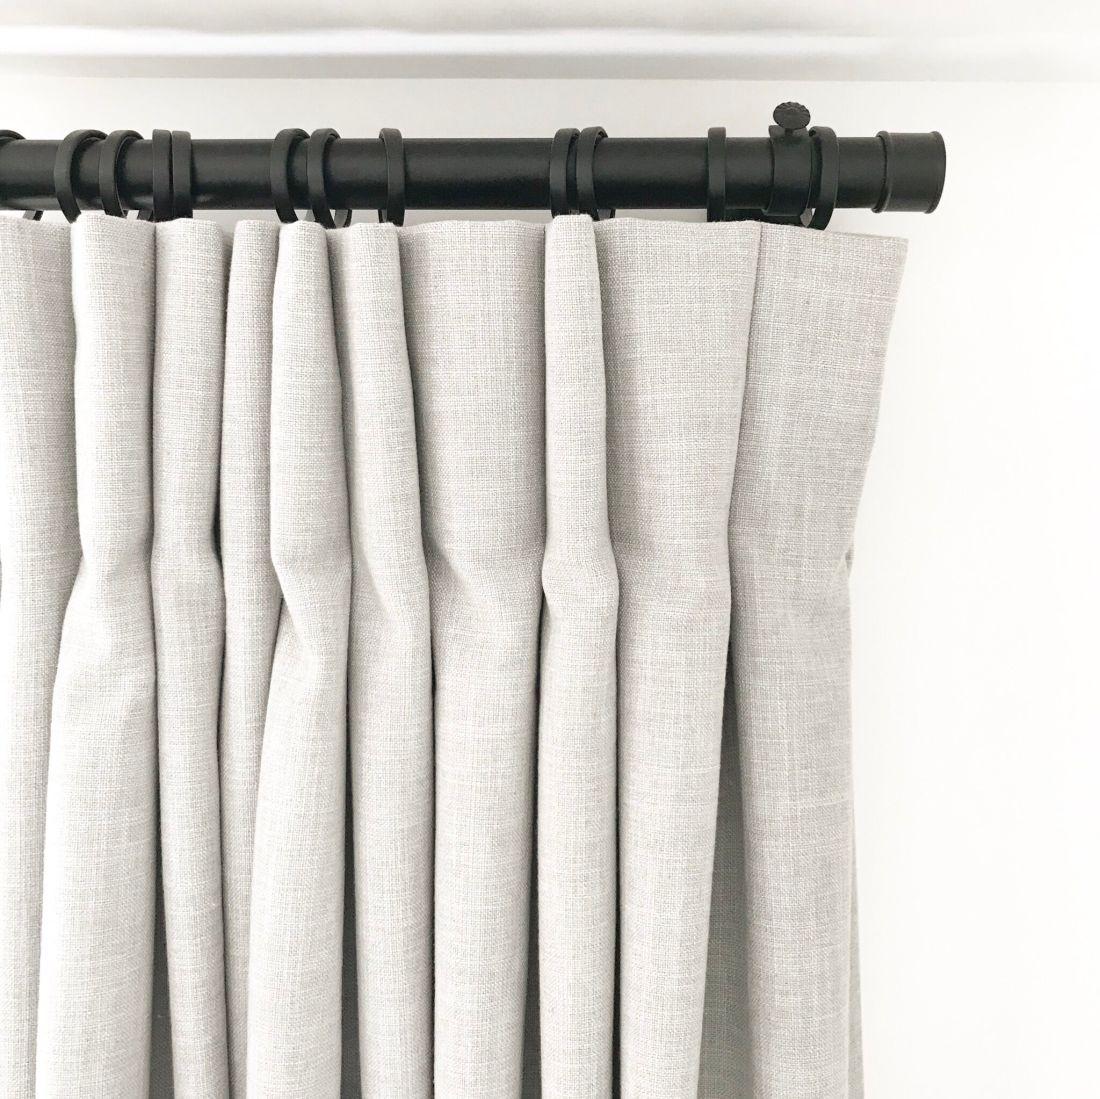 Black Drape Hardware with Grey Linen Drapes